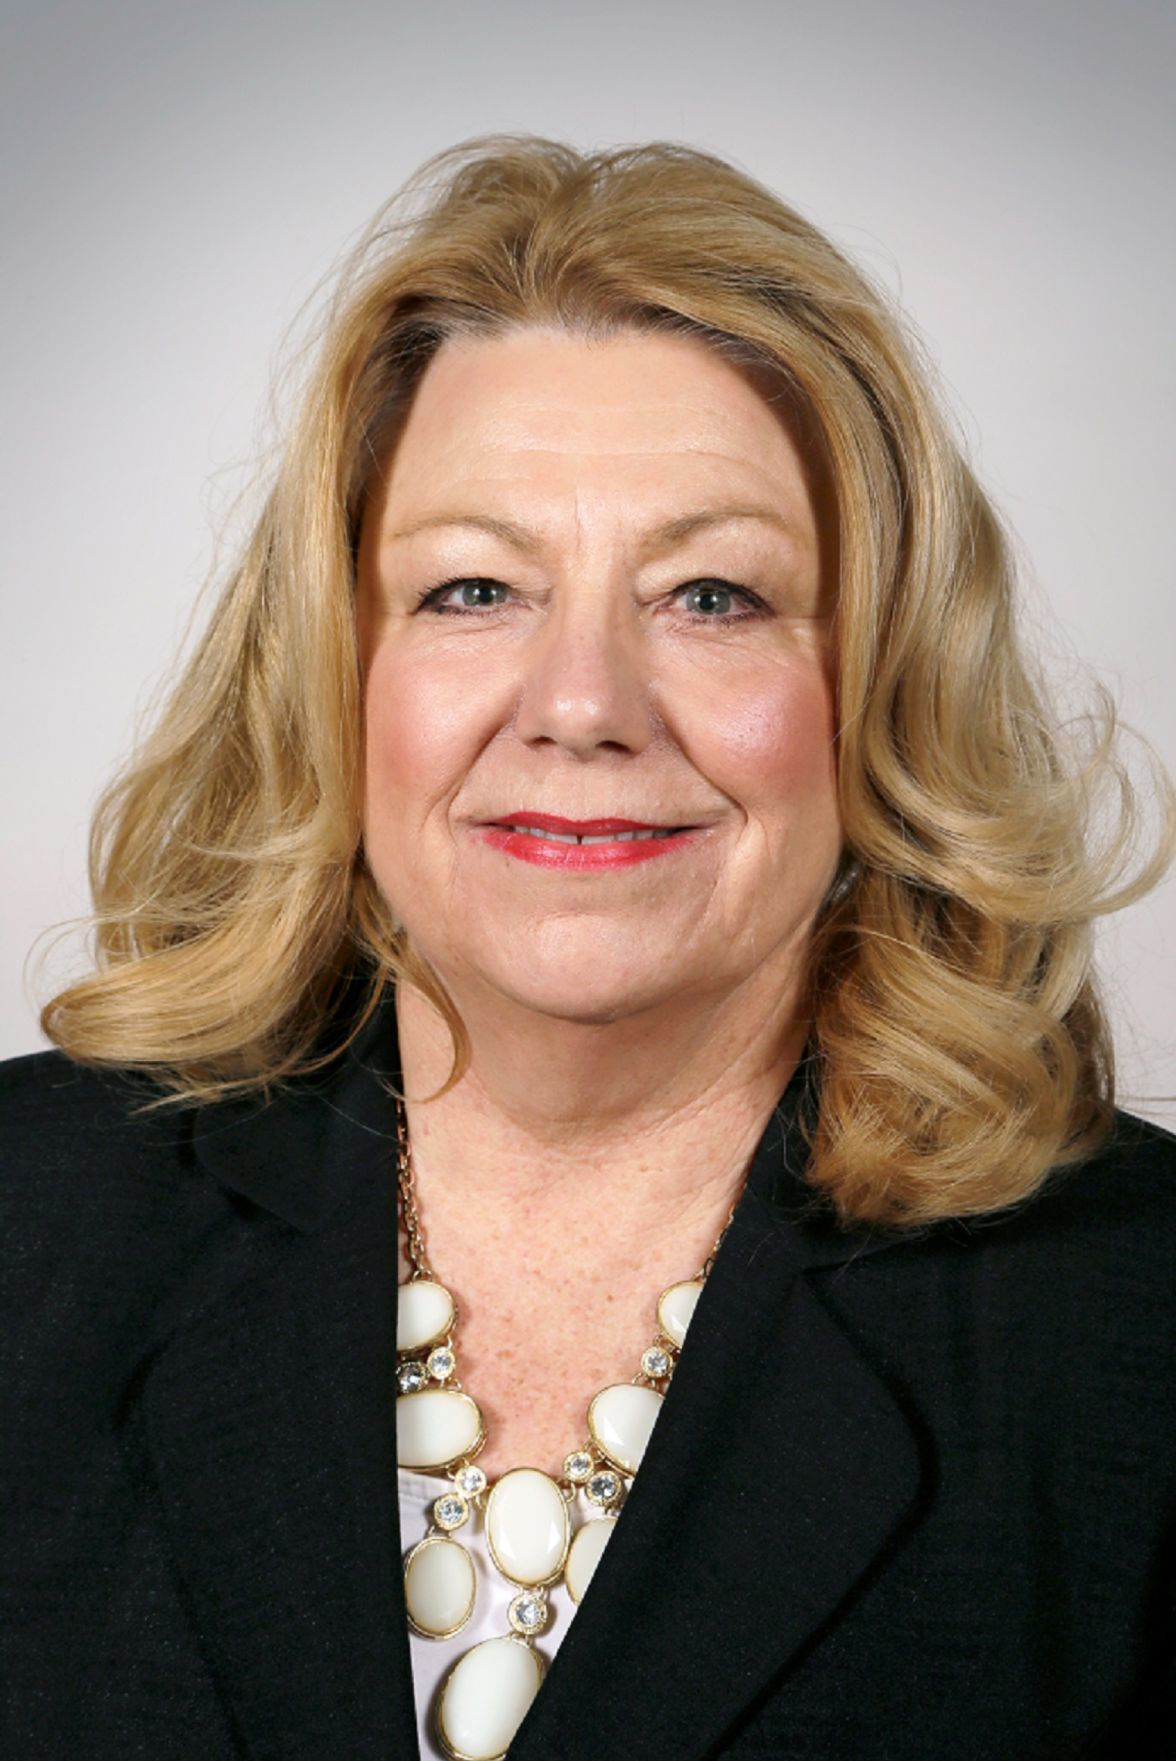 Iowa state Sen. Pam Jochum